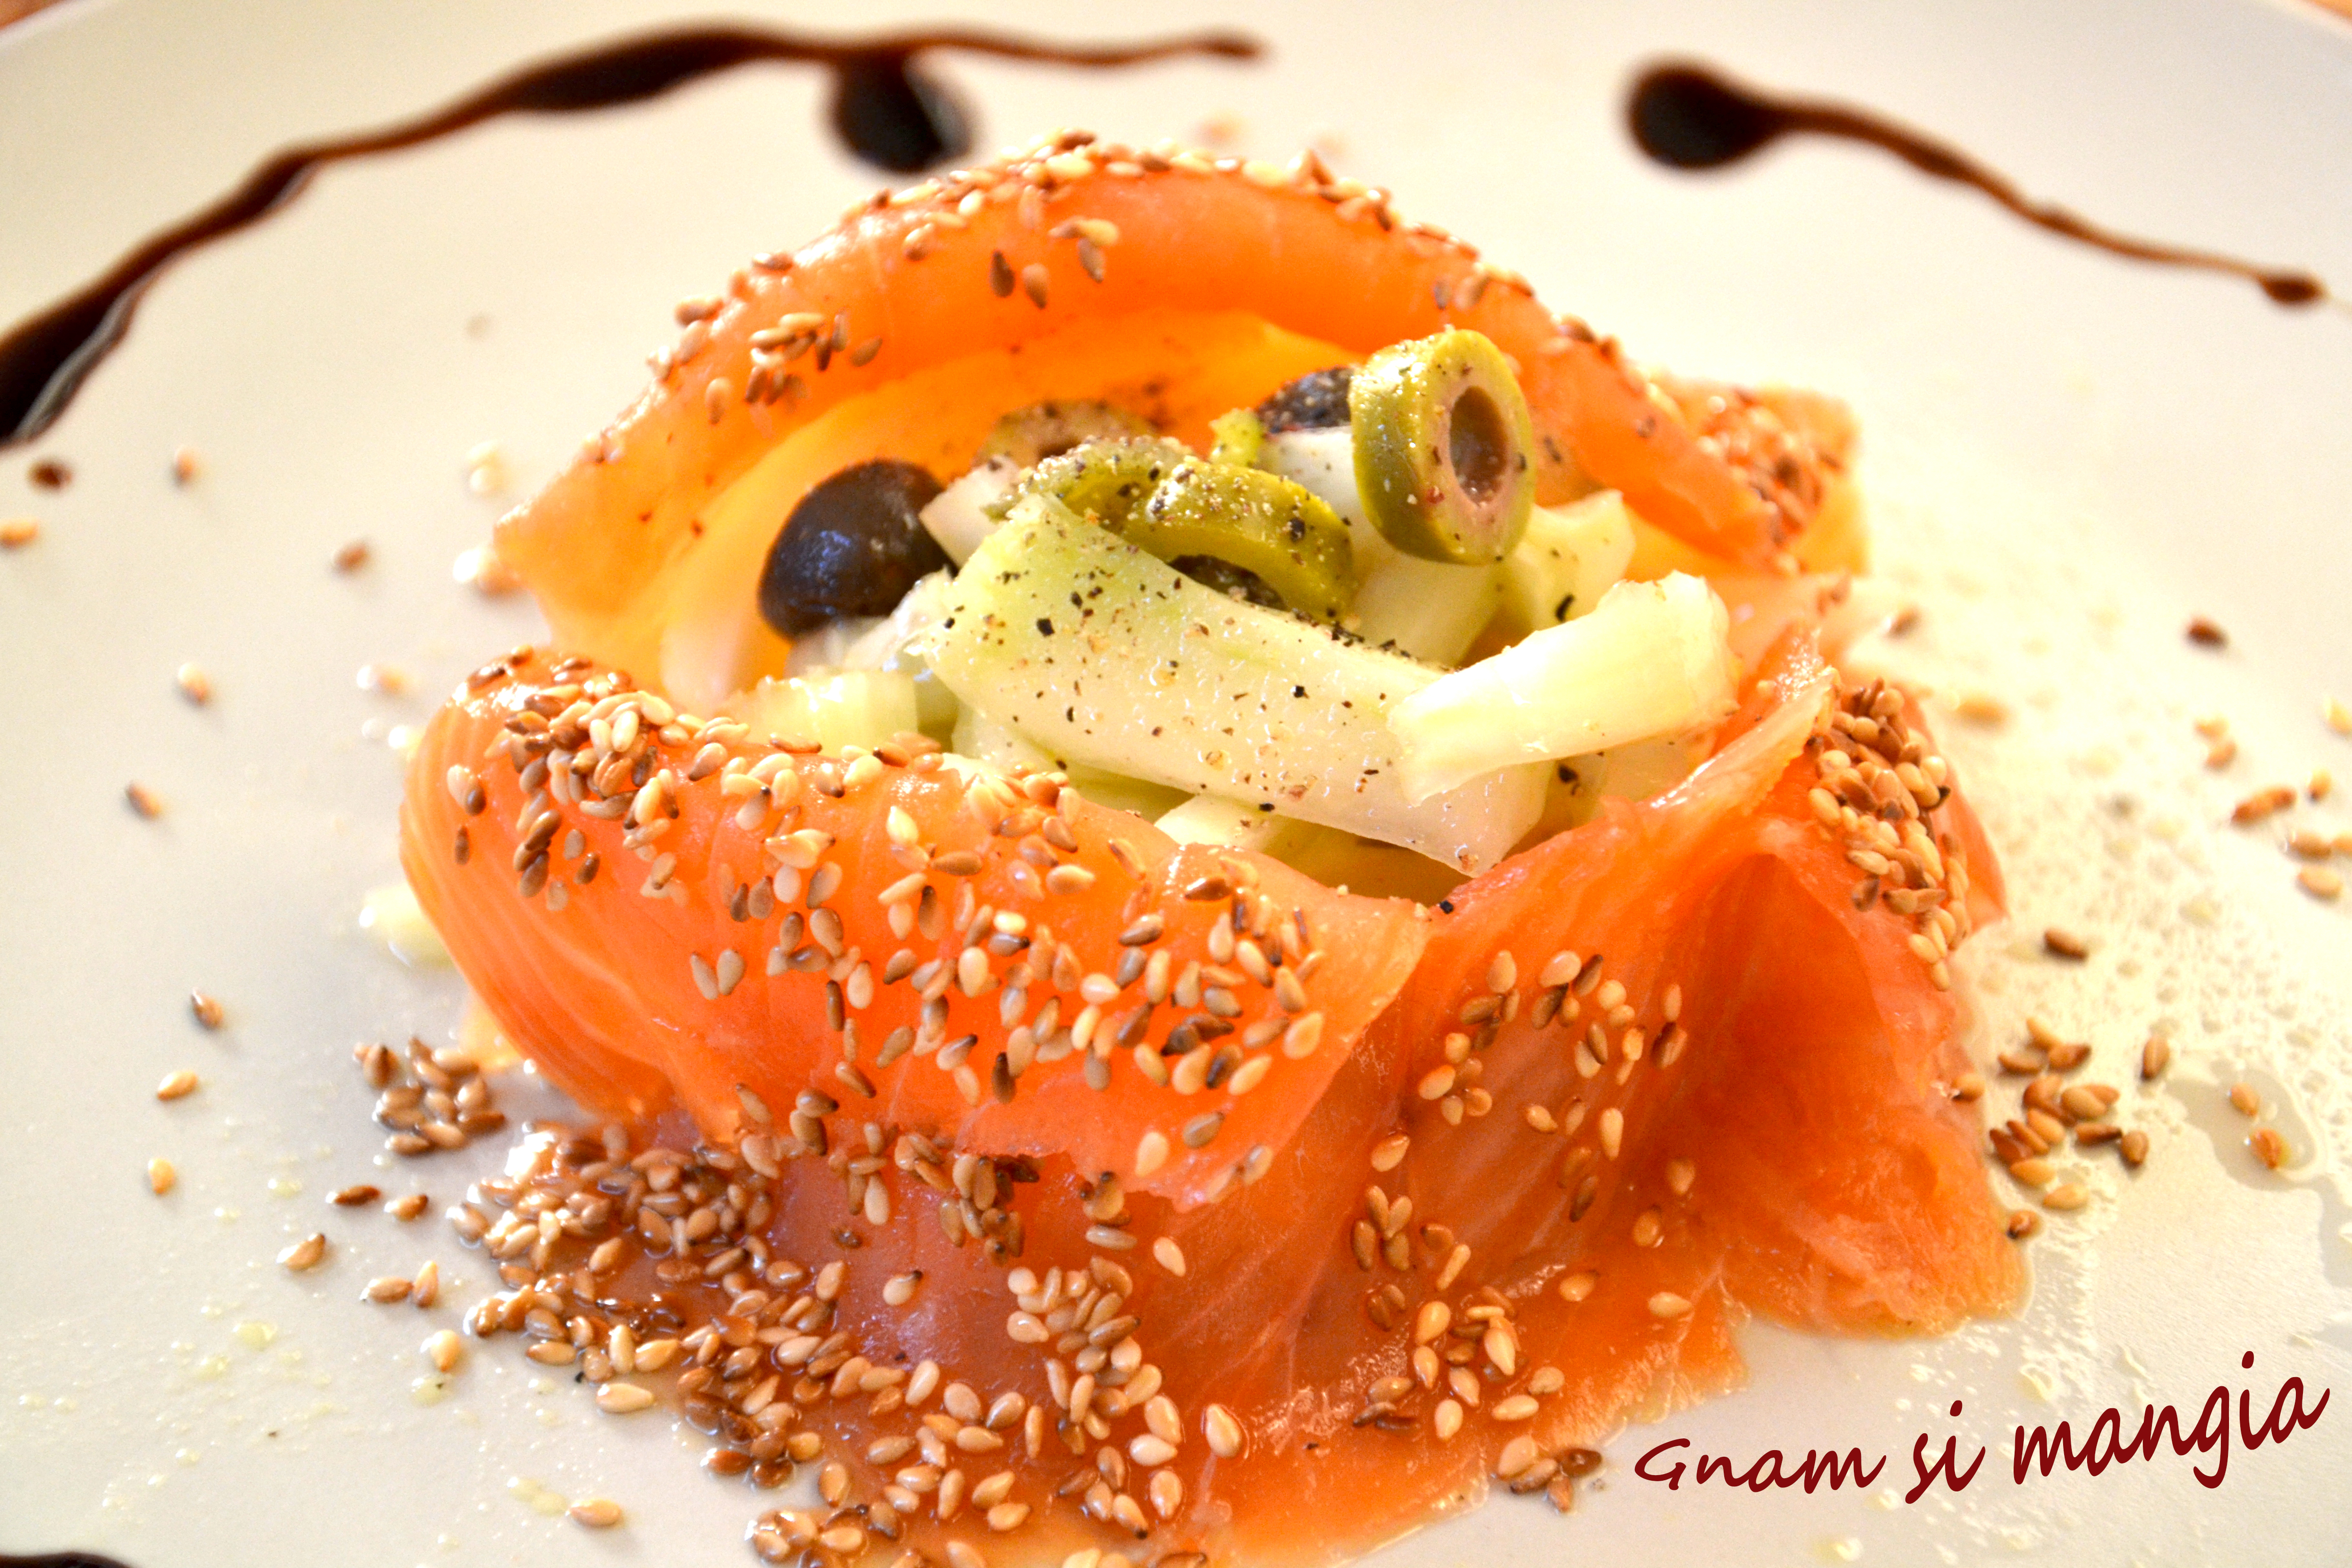 Ricerca ricette con salmone miele for Salmone ricette